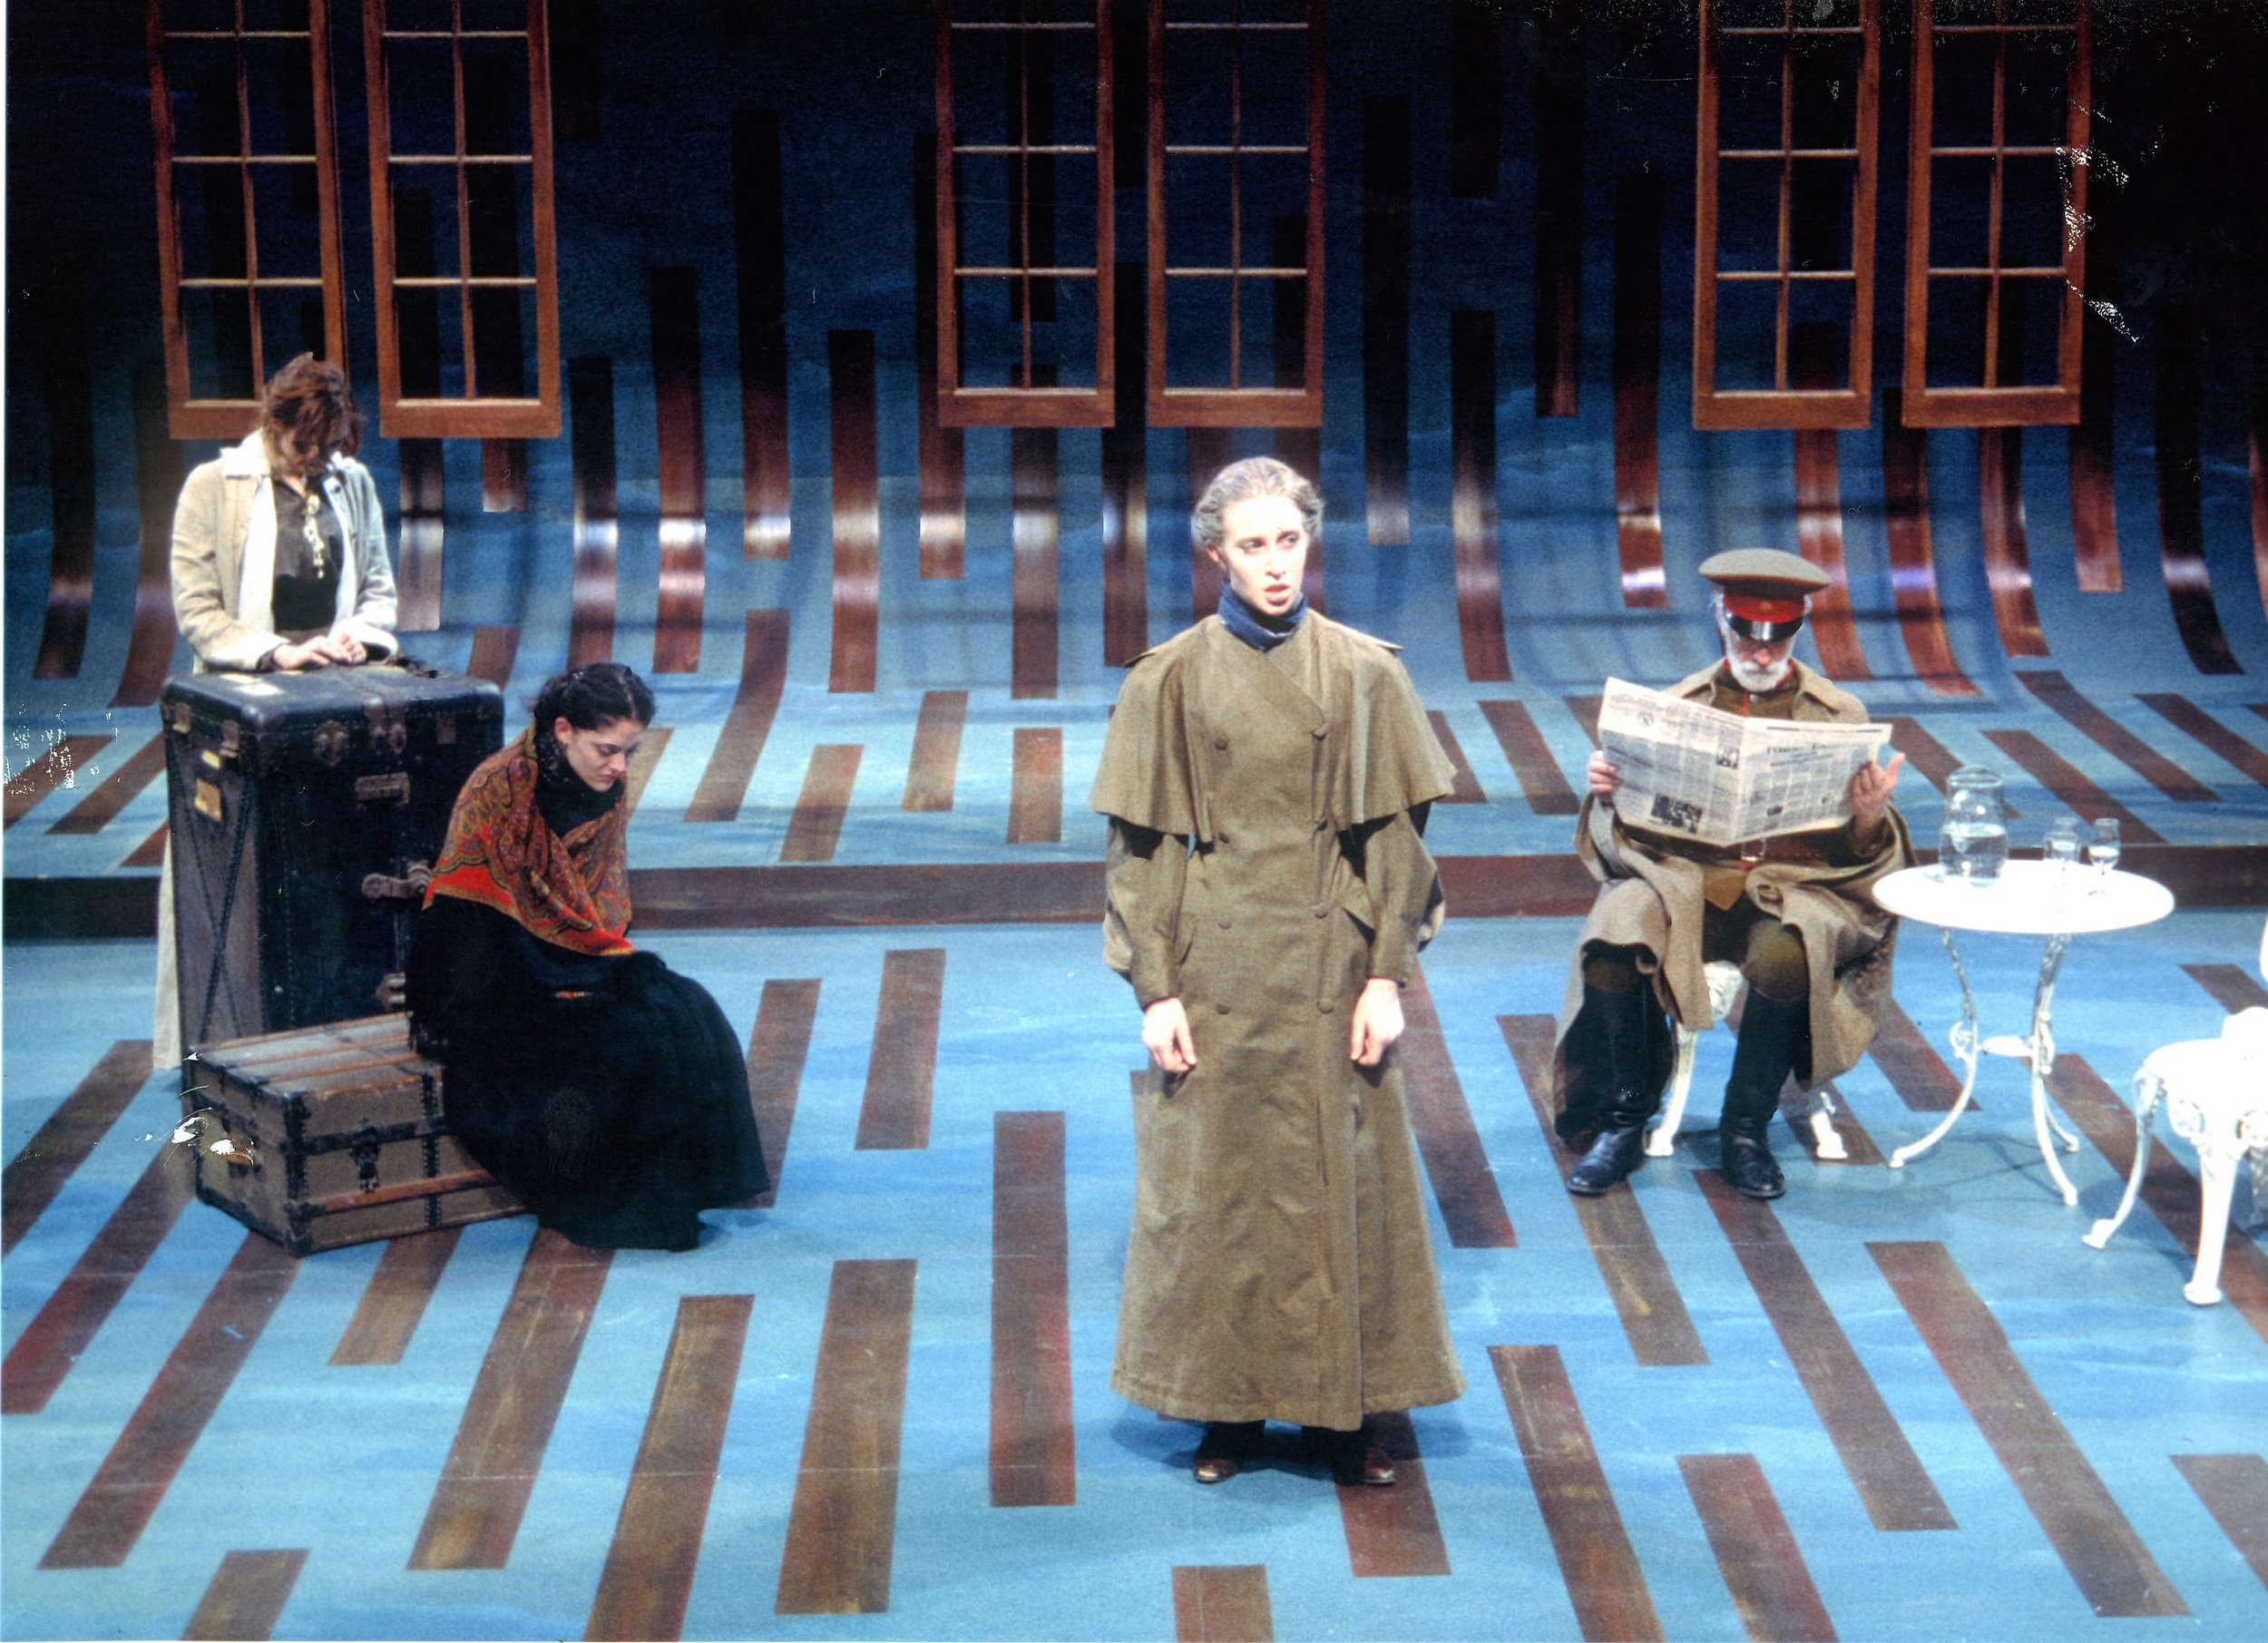 THREE SISTERS, Cornell University, 2000.